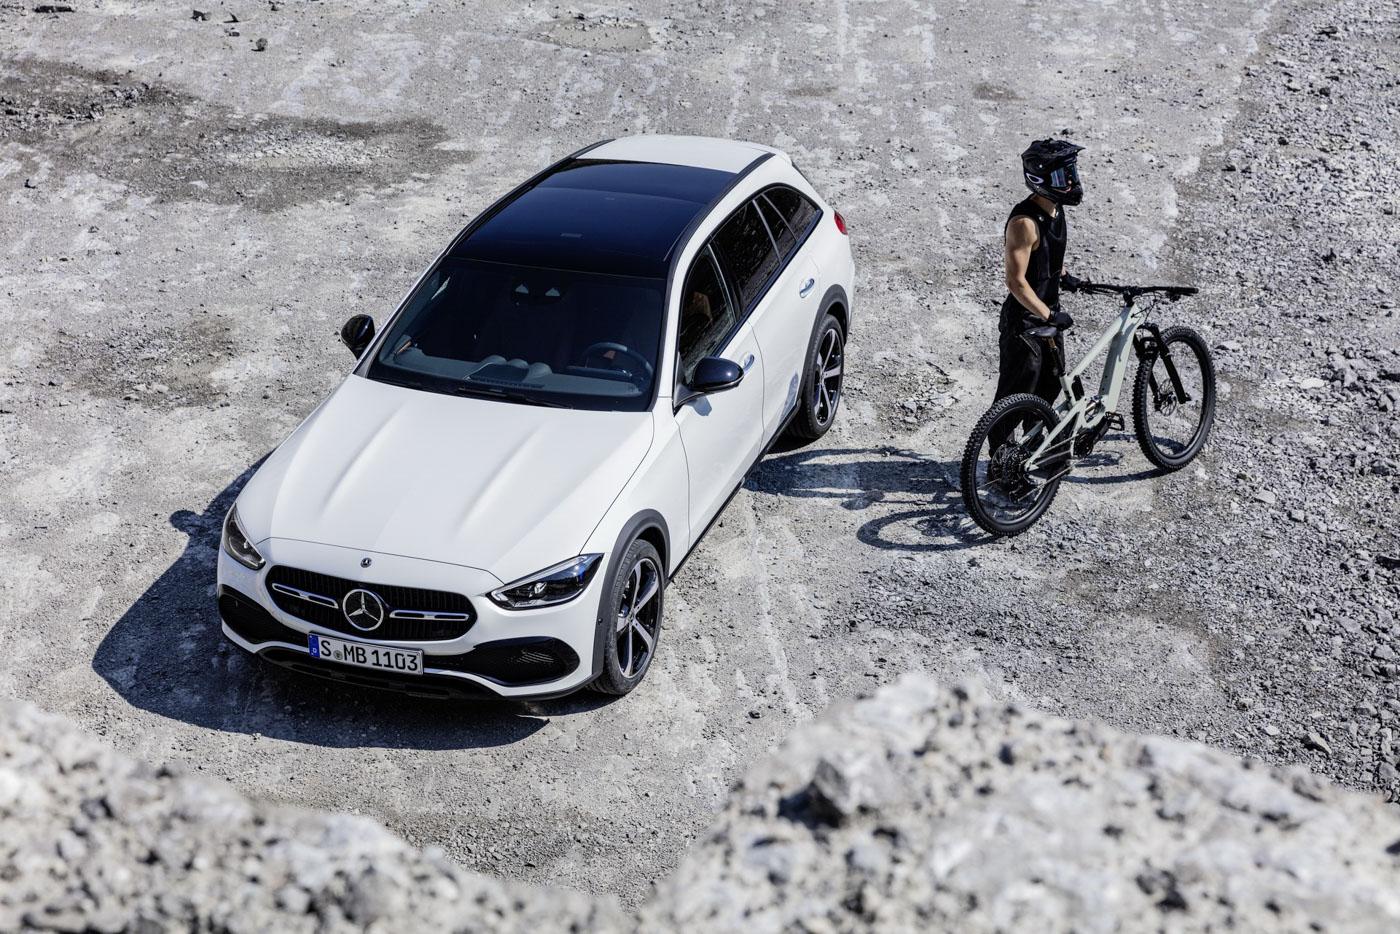 Mercedes-benz-c-class-all-terrain-di-den-moi-noi-cung-mau-xe-gia-dinh-day-thuc-dung (16).JPG